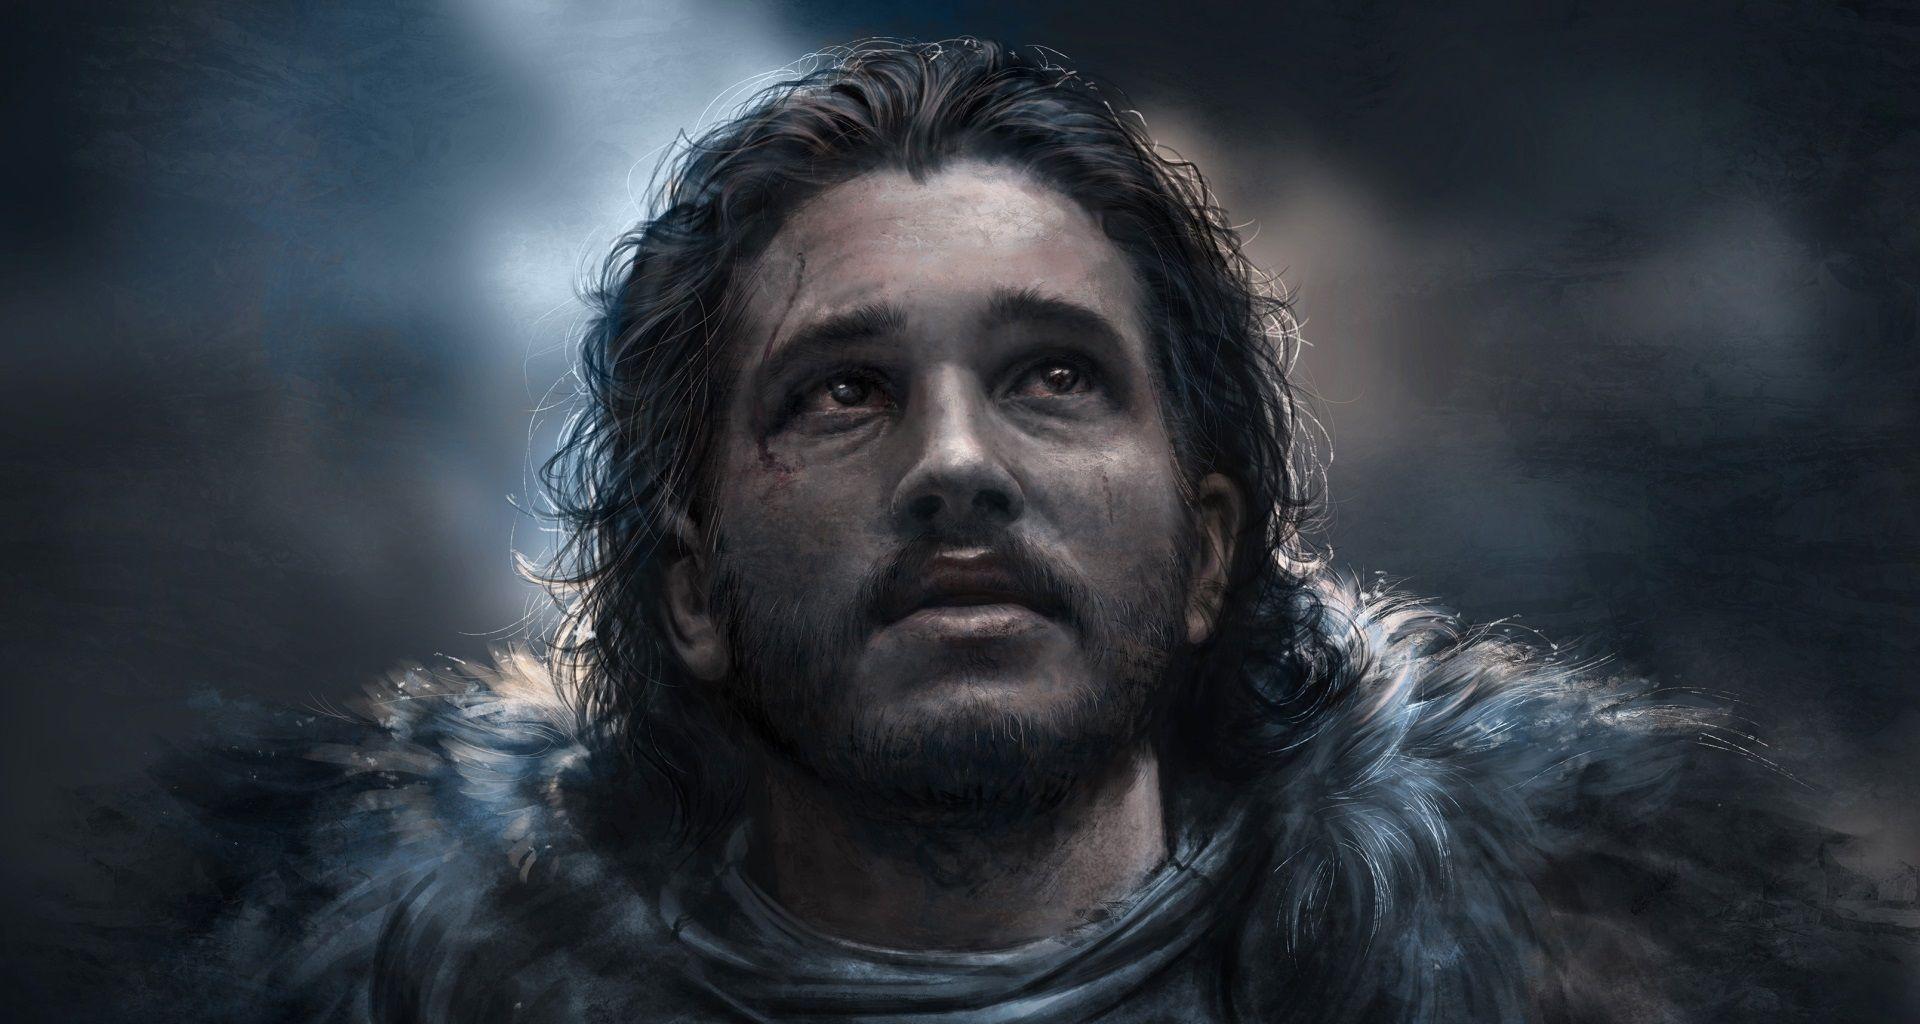 art from Game of Thrones Jon Snow